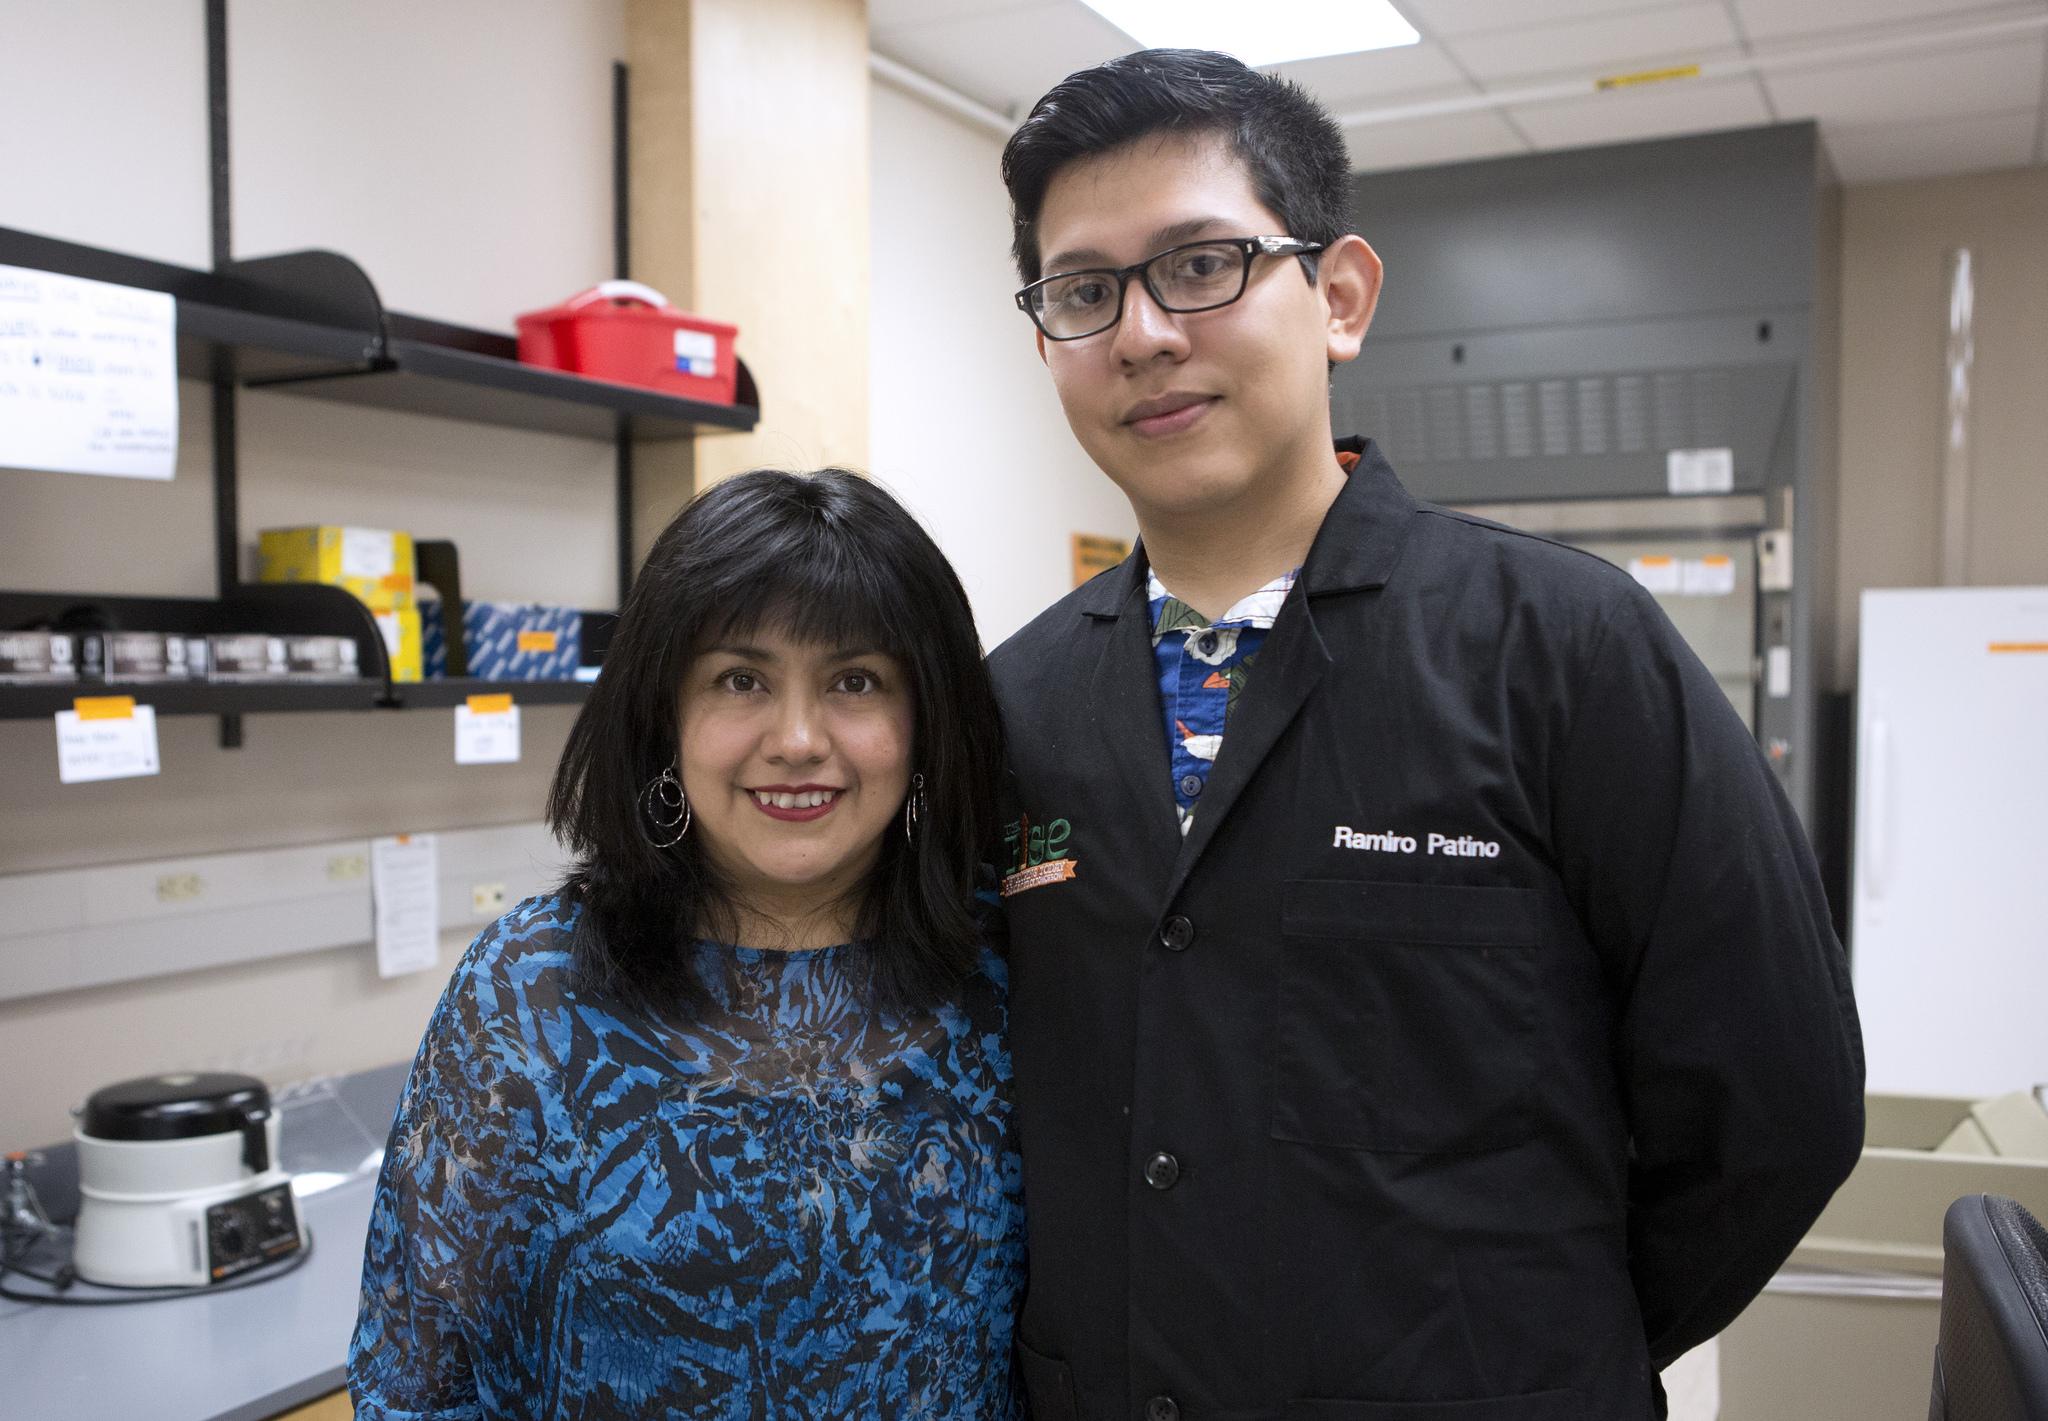 PHOTO 1 - Dr. Feria and Ramiro Patino_1466621583533.jpg